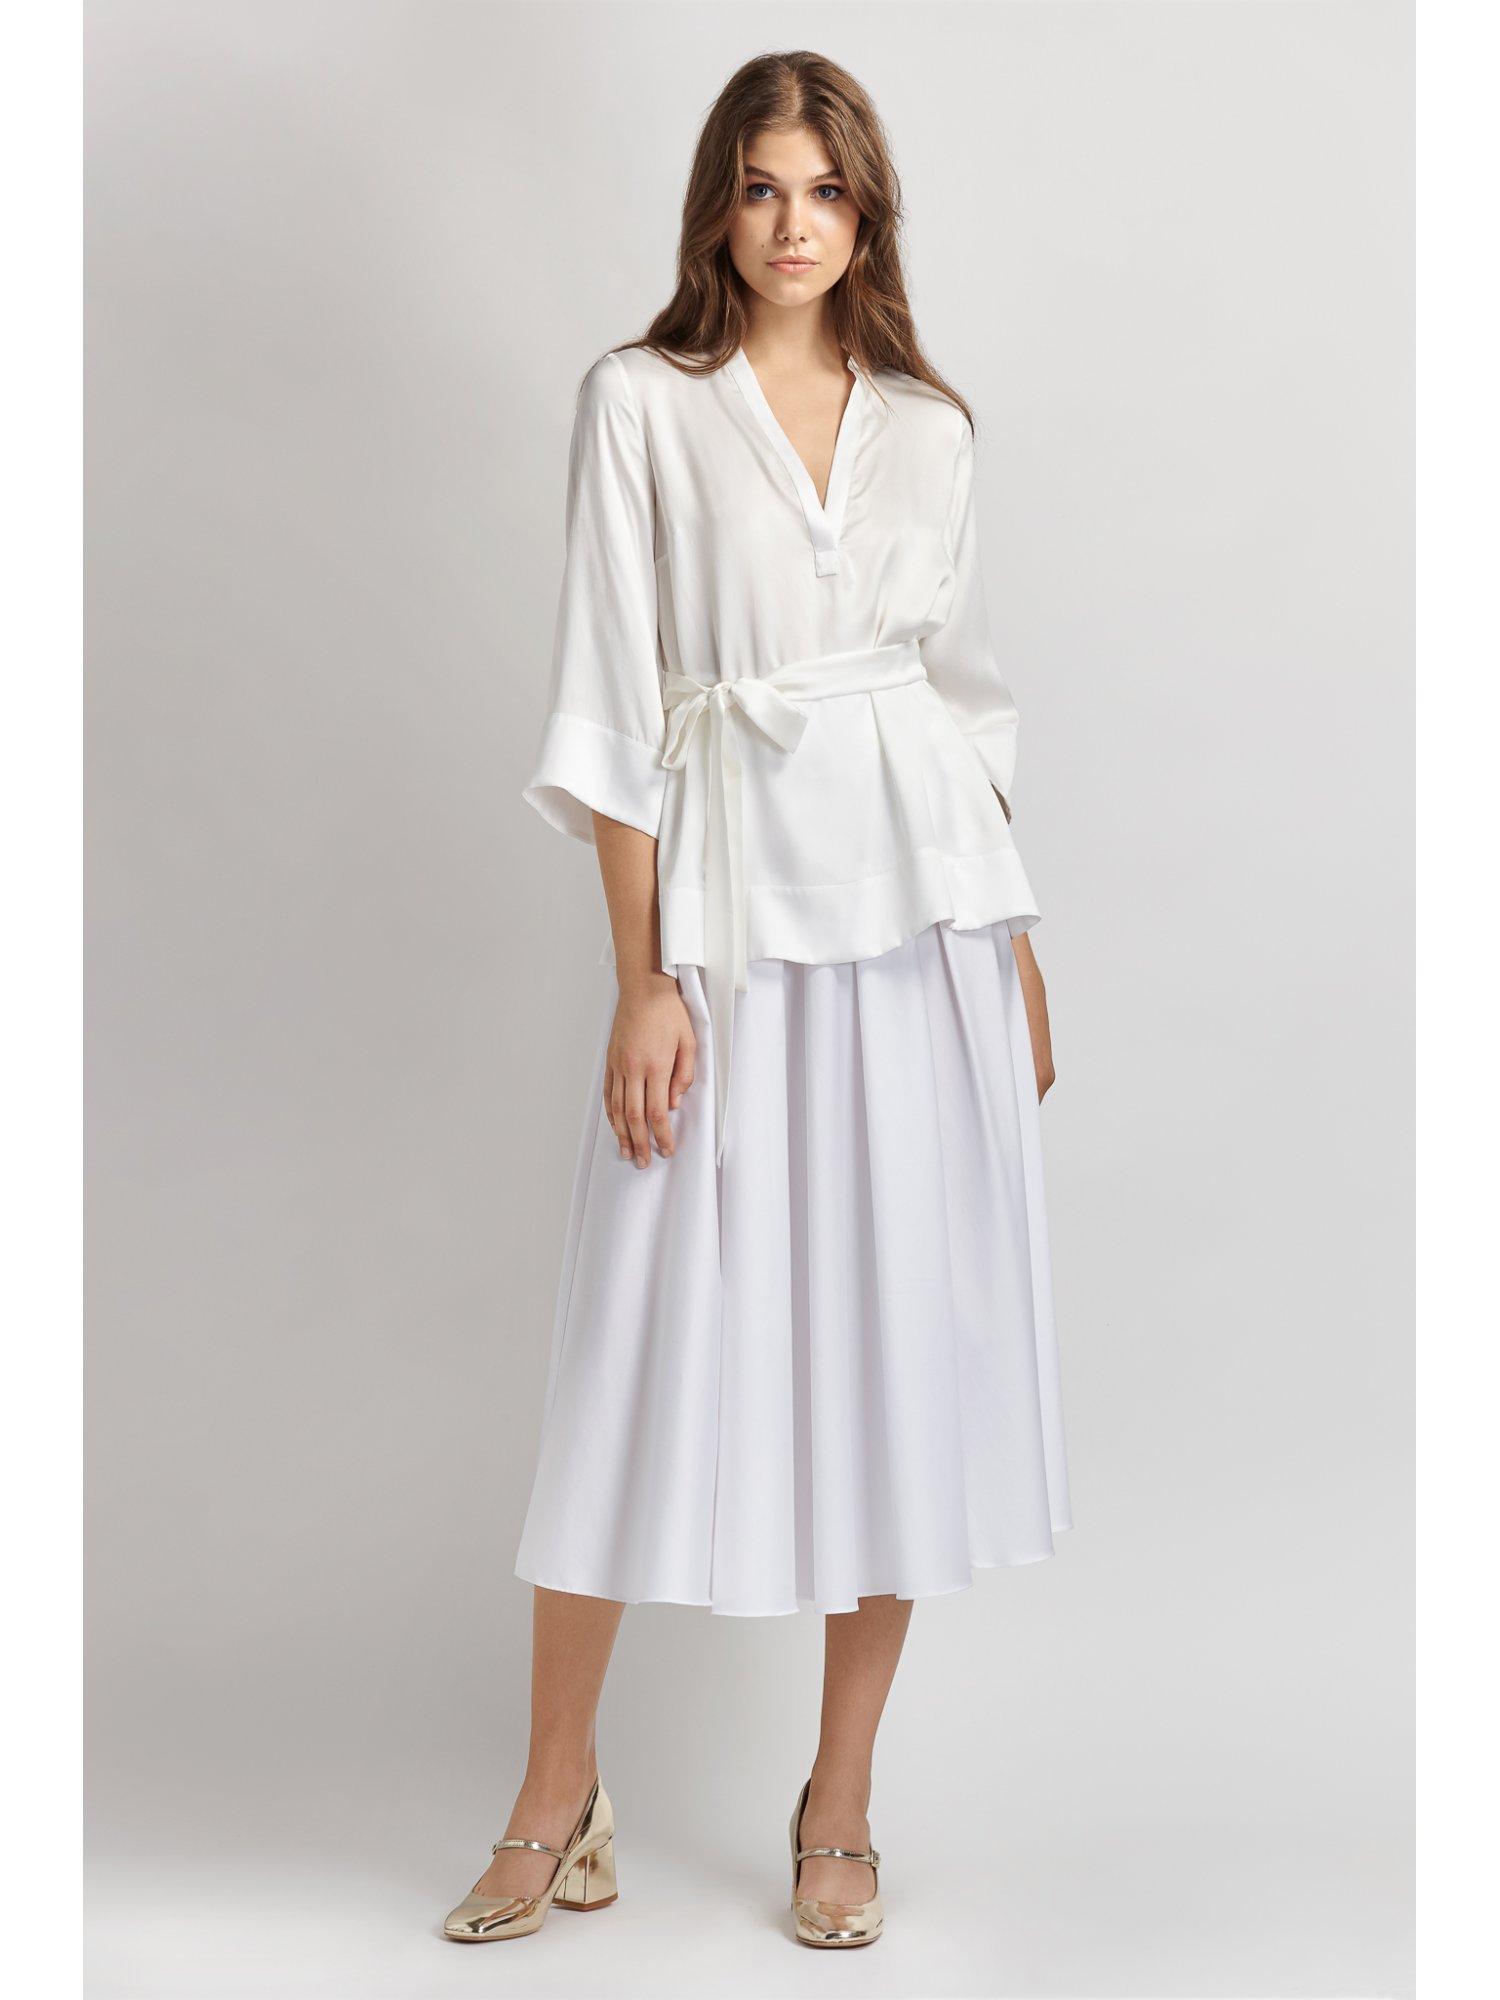 Ampelus blouse